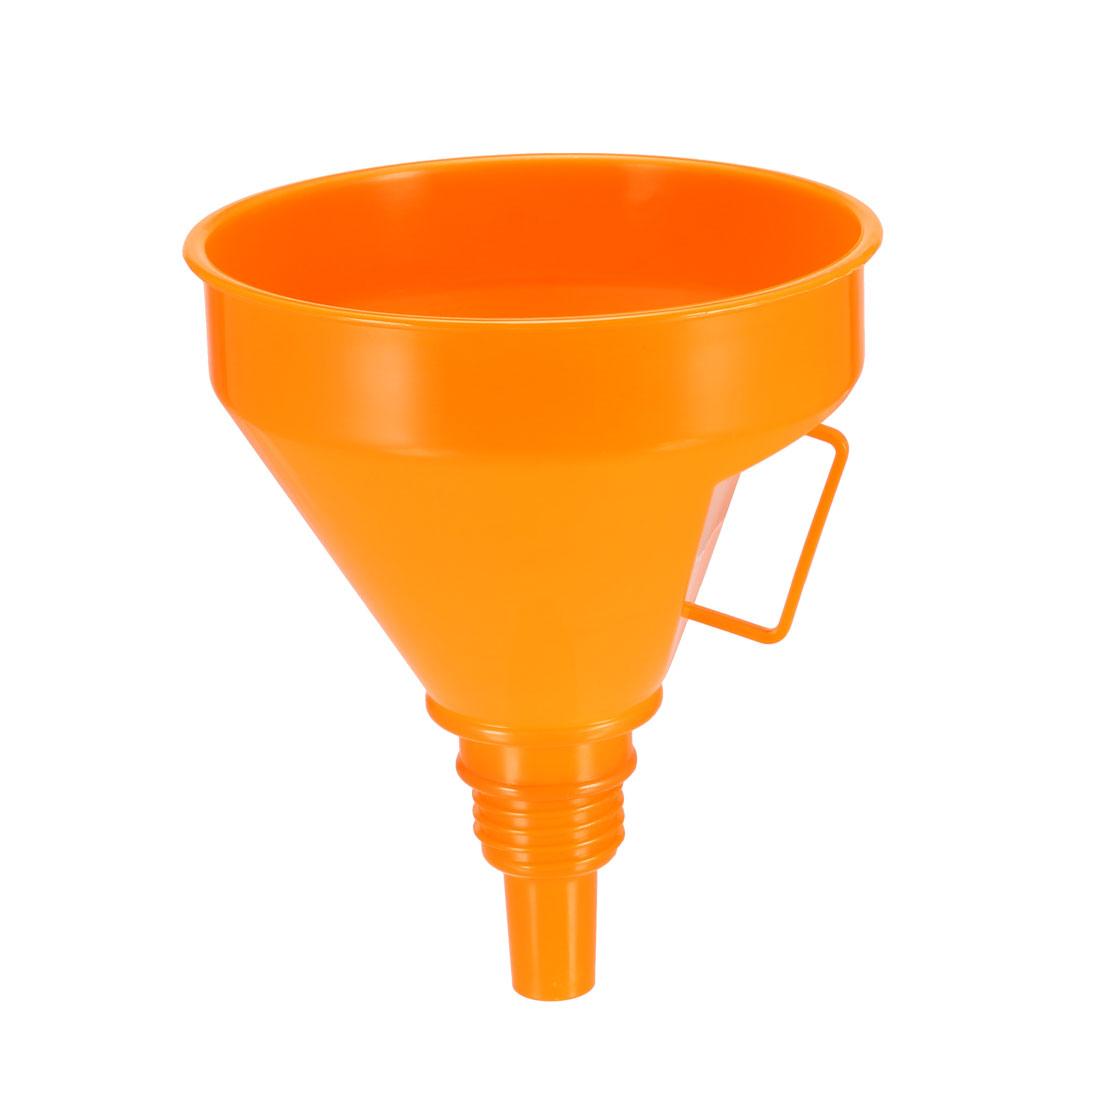 Filter Funnel 5 inch Plastic Feul Funnel Orange for Petrol Engine Oil Water Fuel